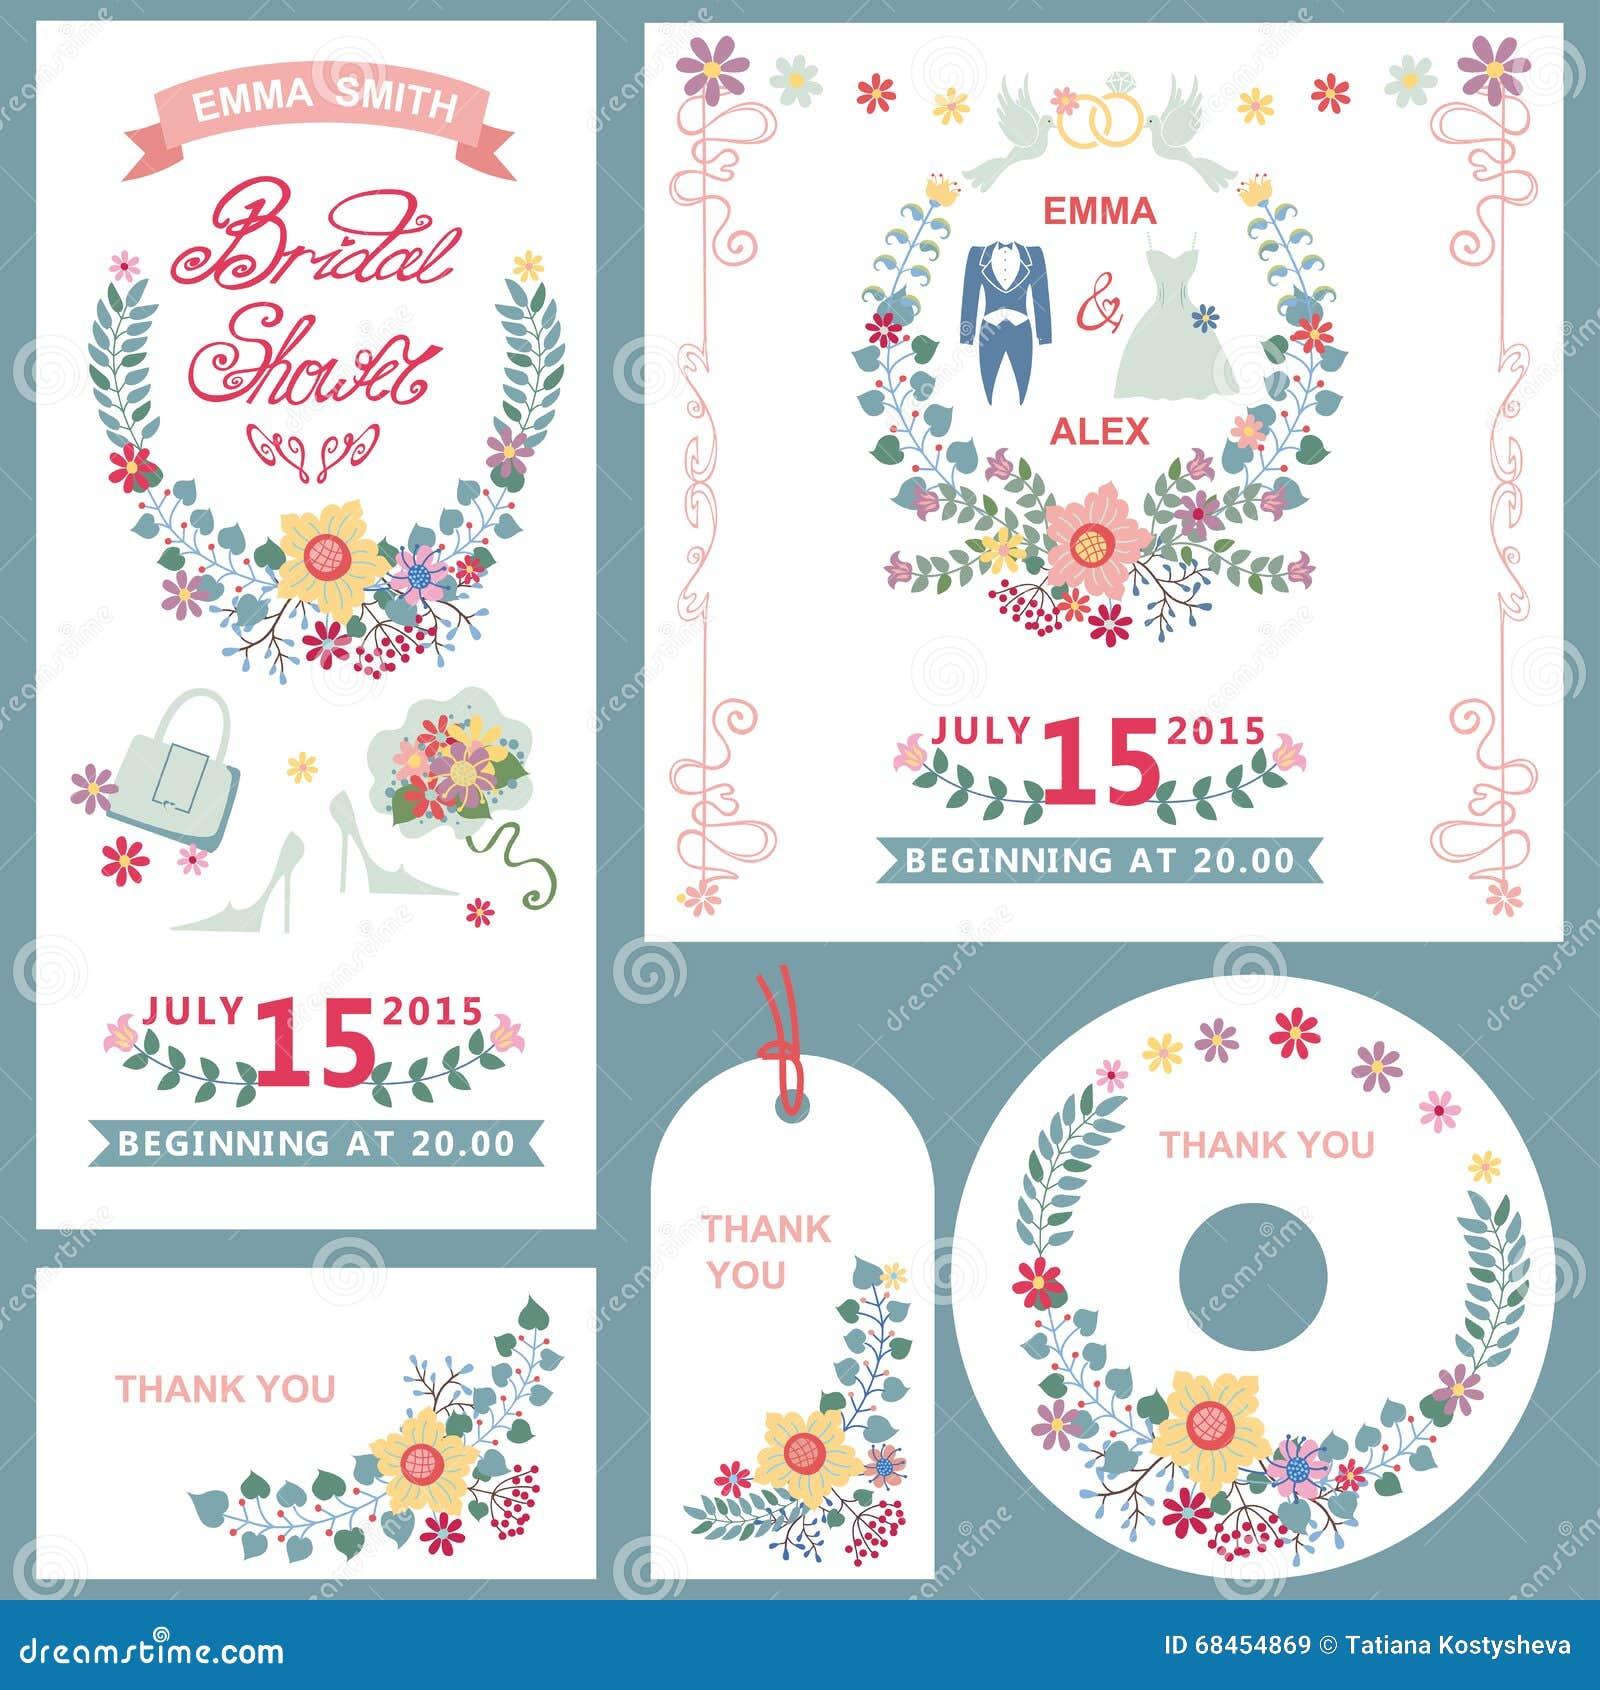 weddingbridal shower invitation cards set with floral decor